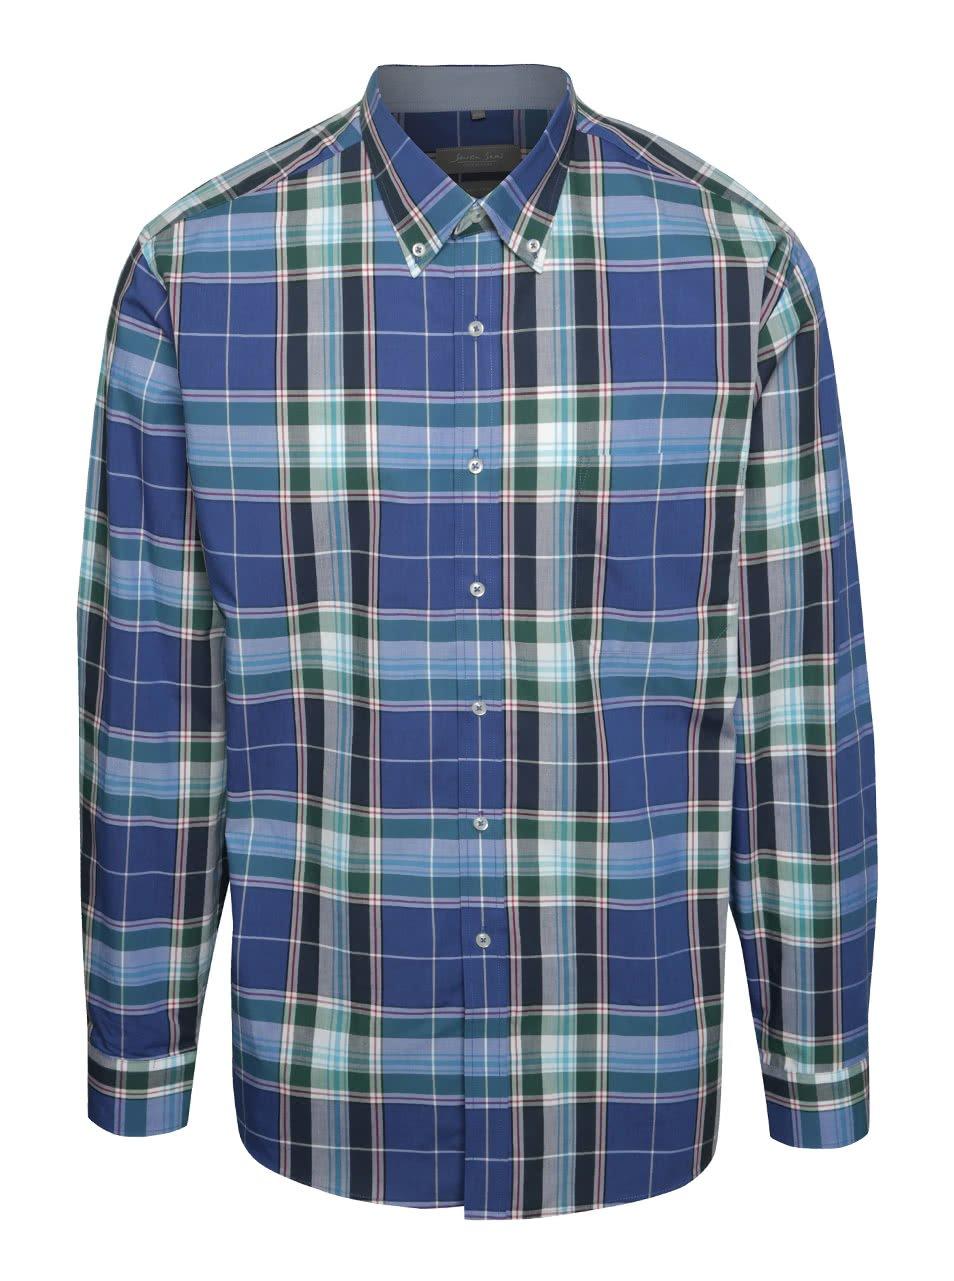 63d74ba3866 Zeleno-modrá kostkovaná košile Seven Seas Milan